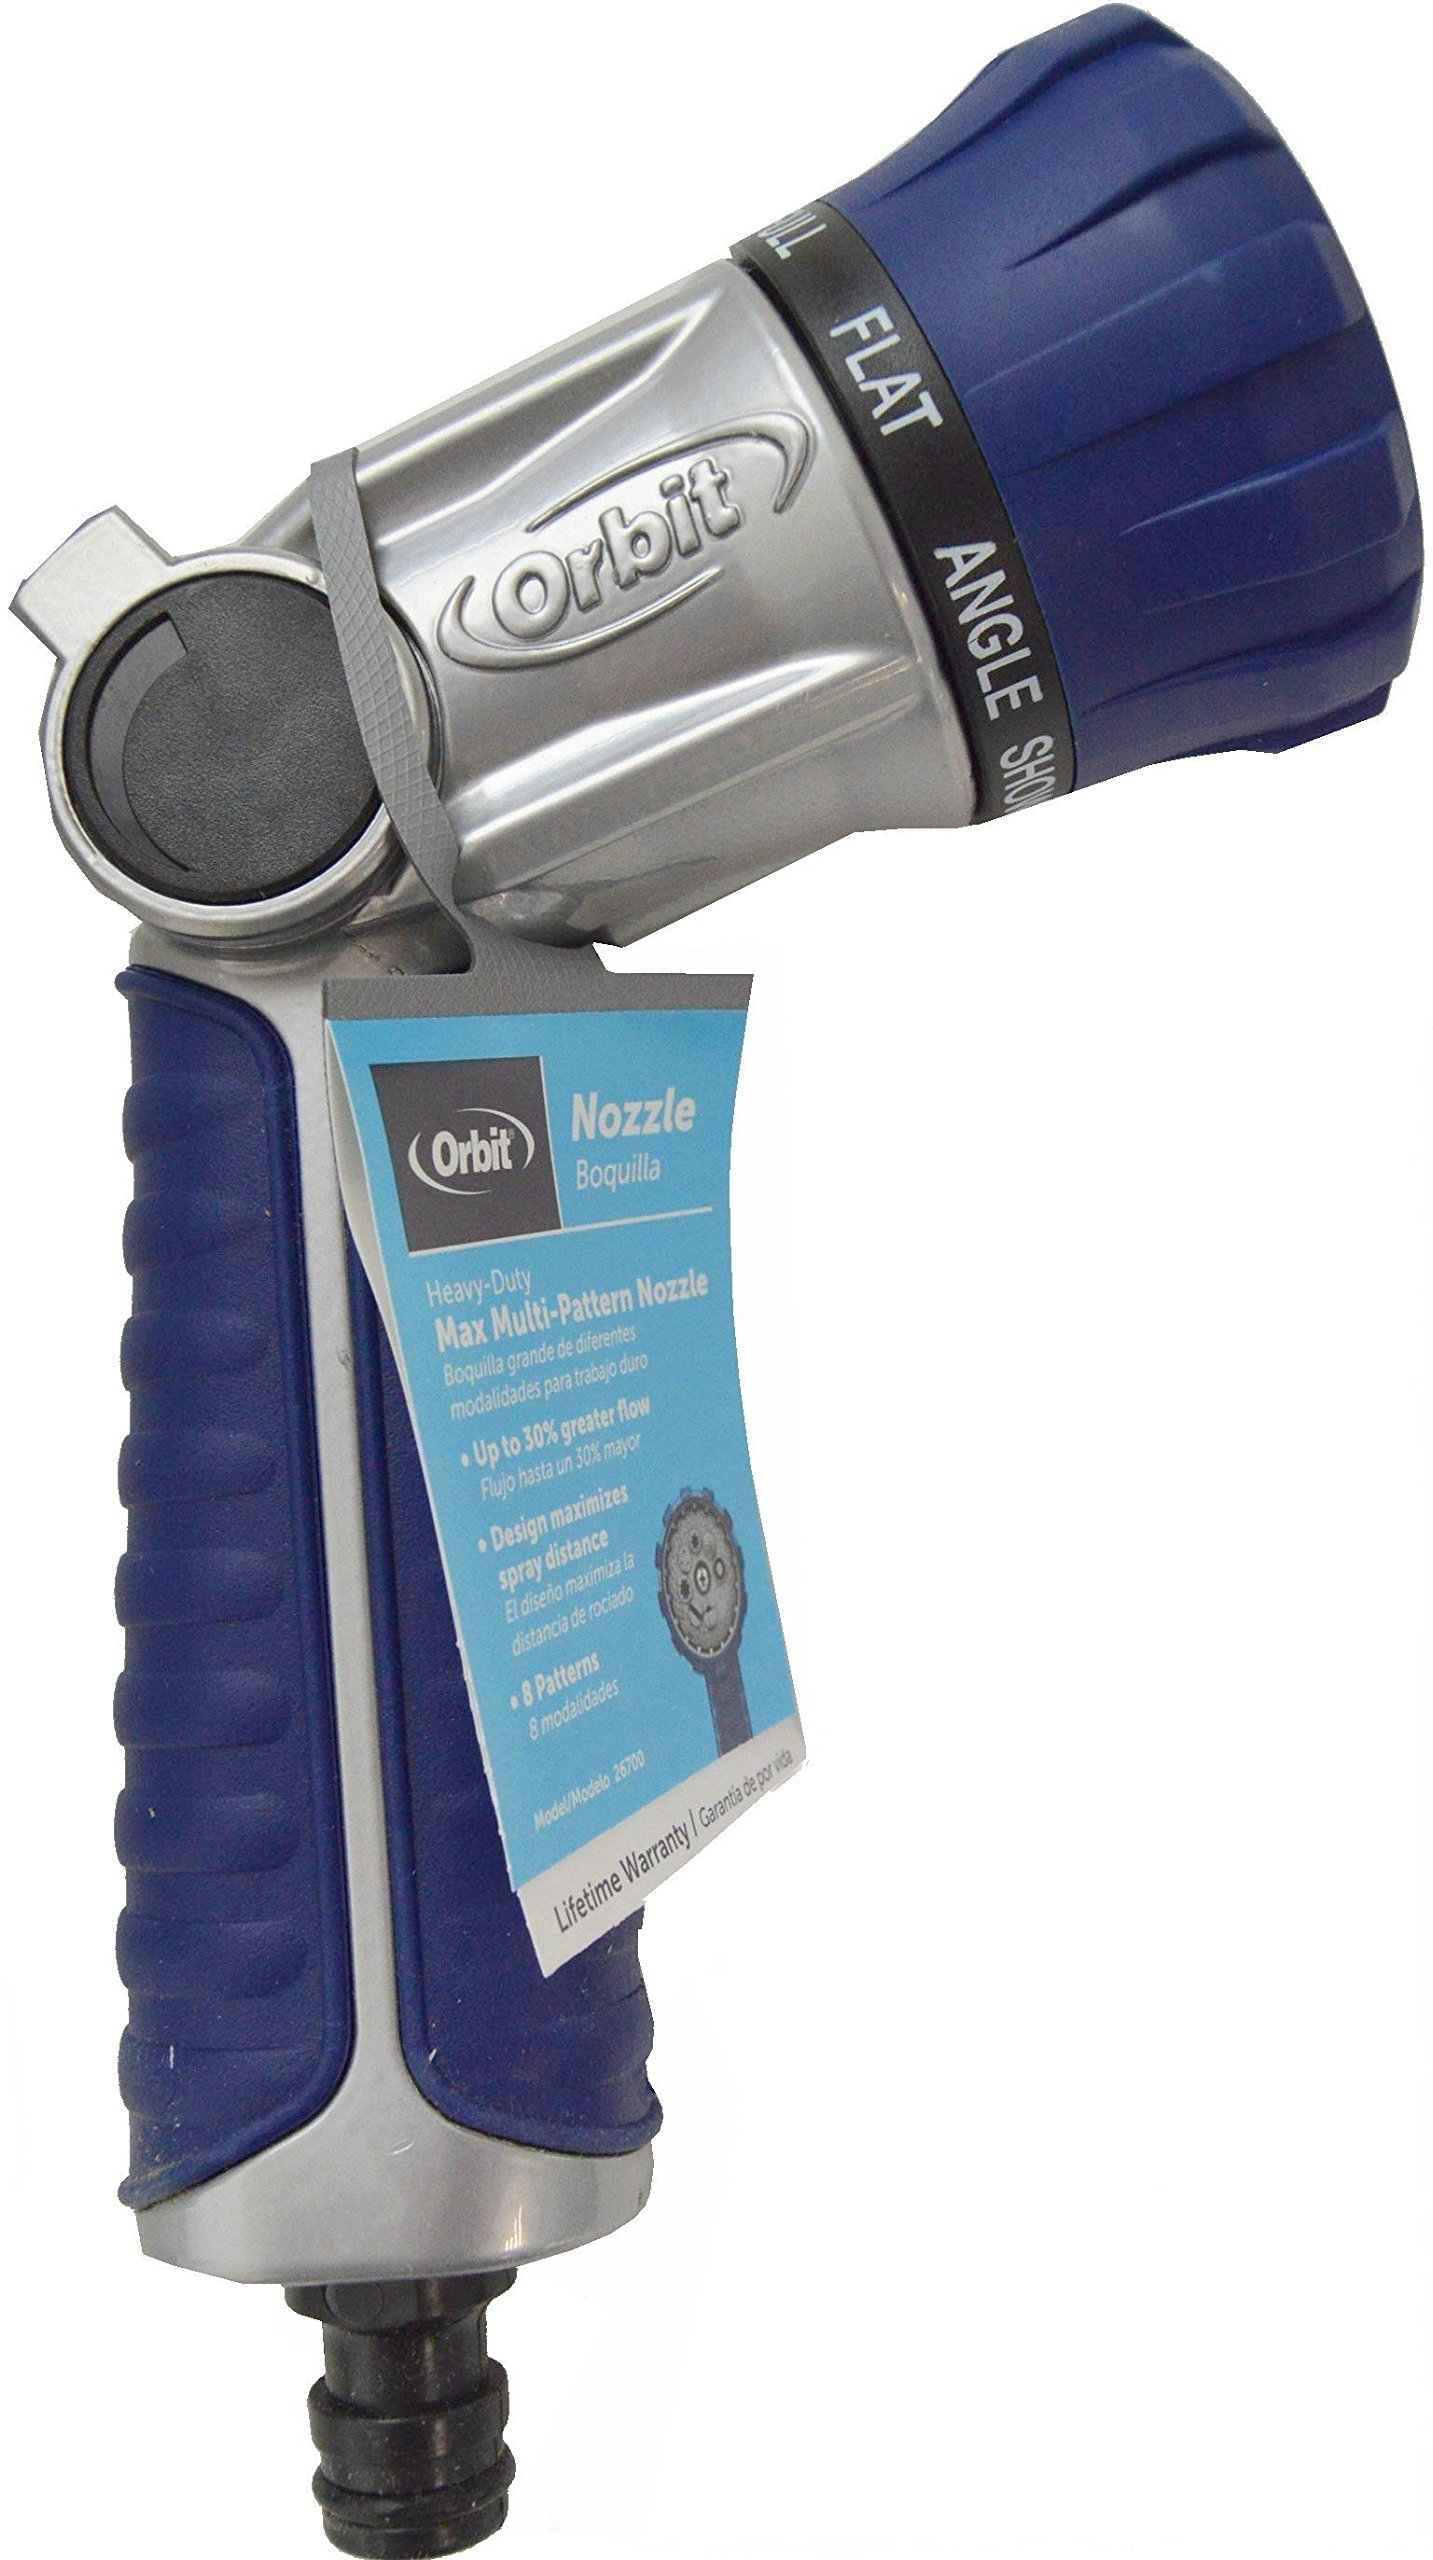 Orbit Max 26700 8-pattern Commercial Grade Zinc Rubber Coated Grip Rear-thumb Nozzle